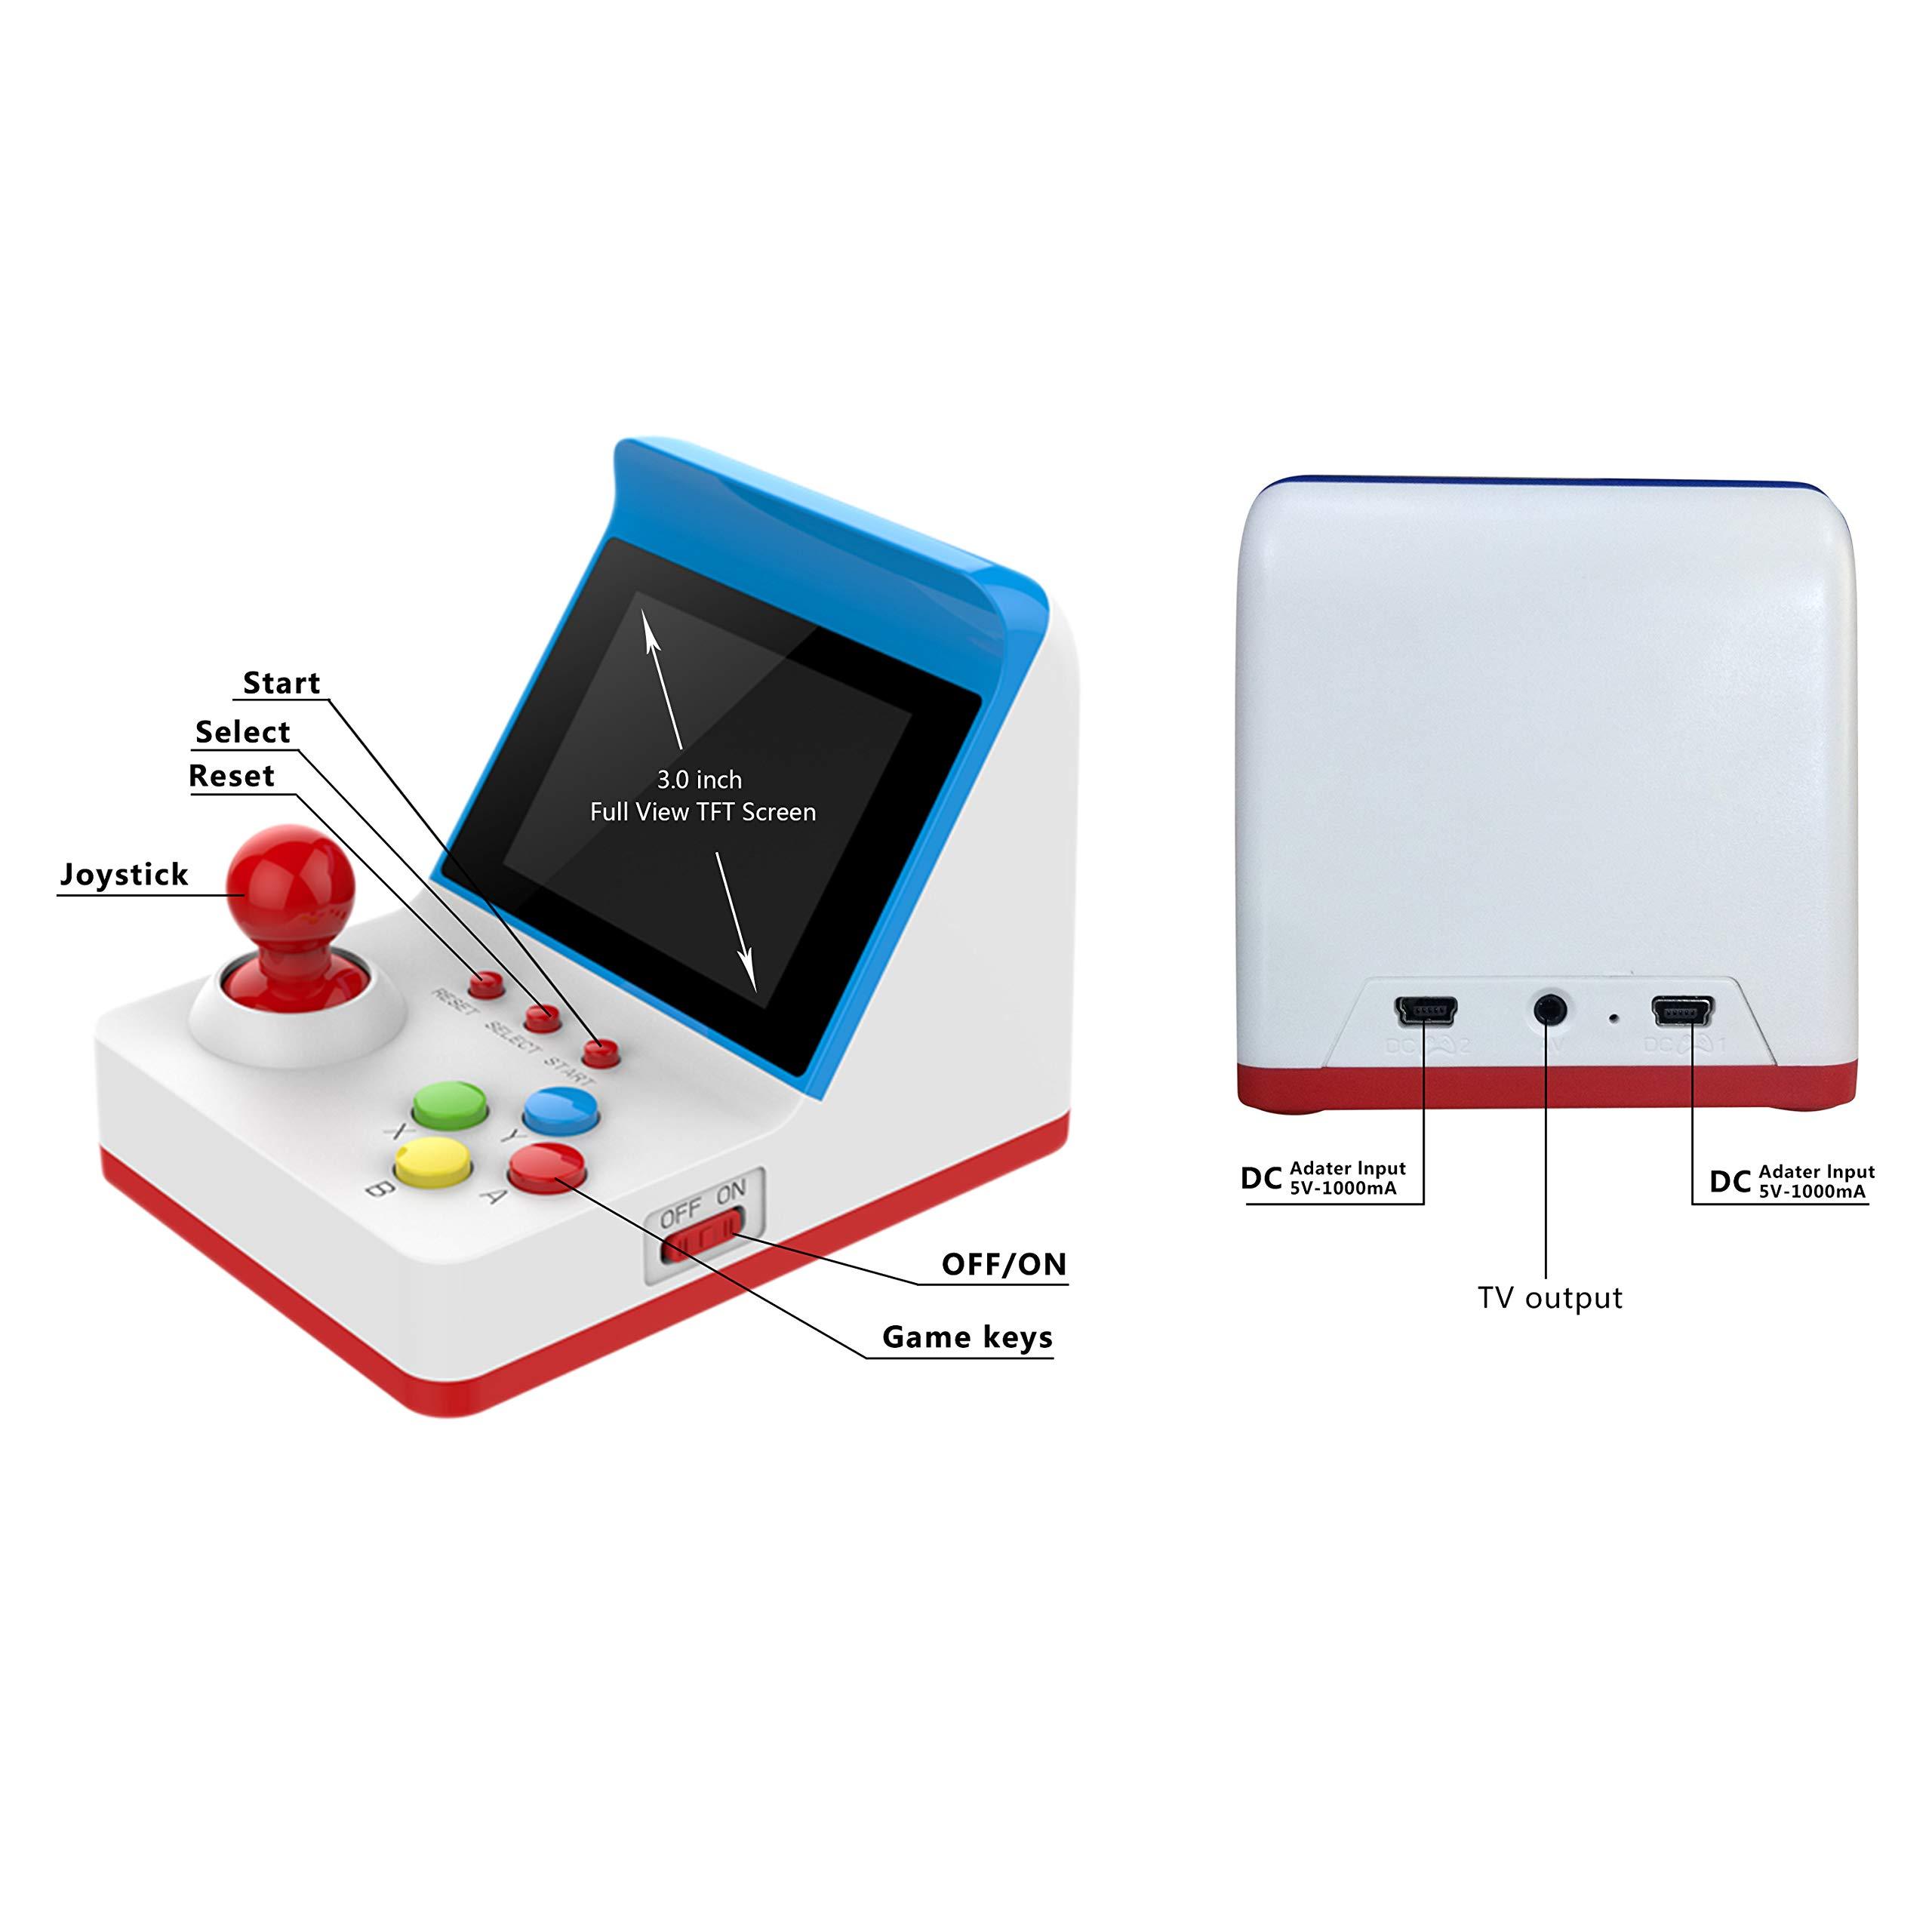 BAORUITENG Handheld Game Console, Retro FC Game Console Video Game Console with 3 Inch 360 Classic Games with 2 Joysticks , Birthday Present for Children (red) by BAORUITENG (Image #2)